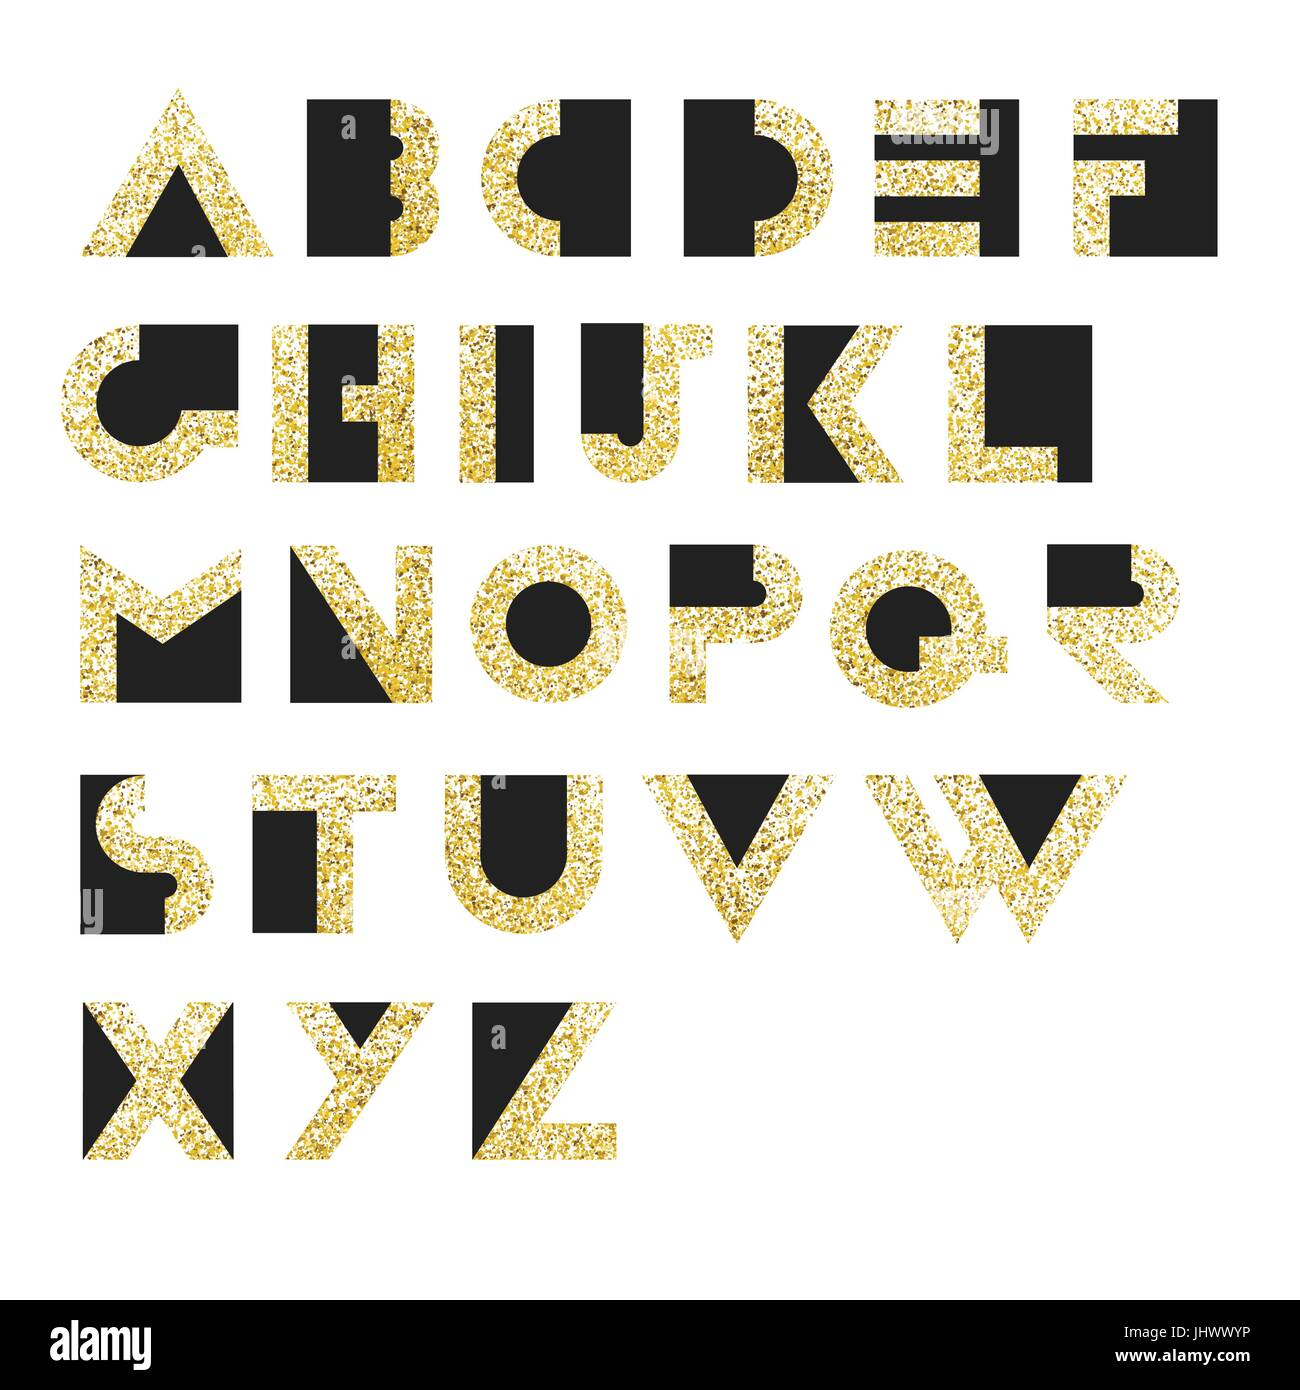 Gold Geometric Retro Alphabet.  Art deco style. Type, font, vintage vector typography - Stock Vector